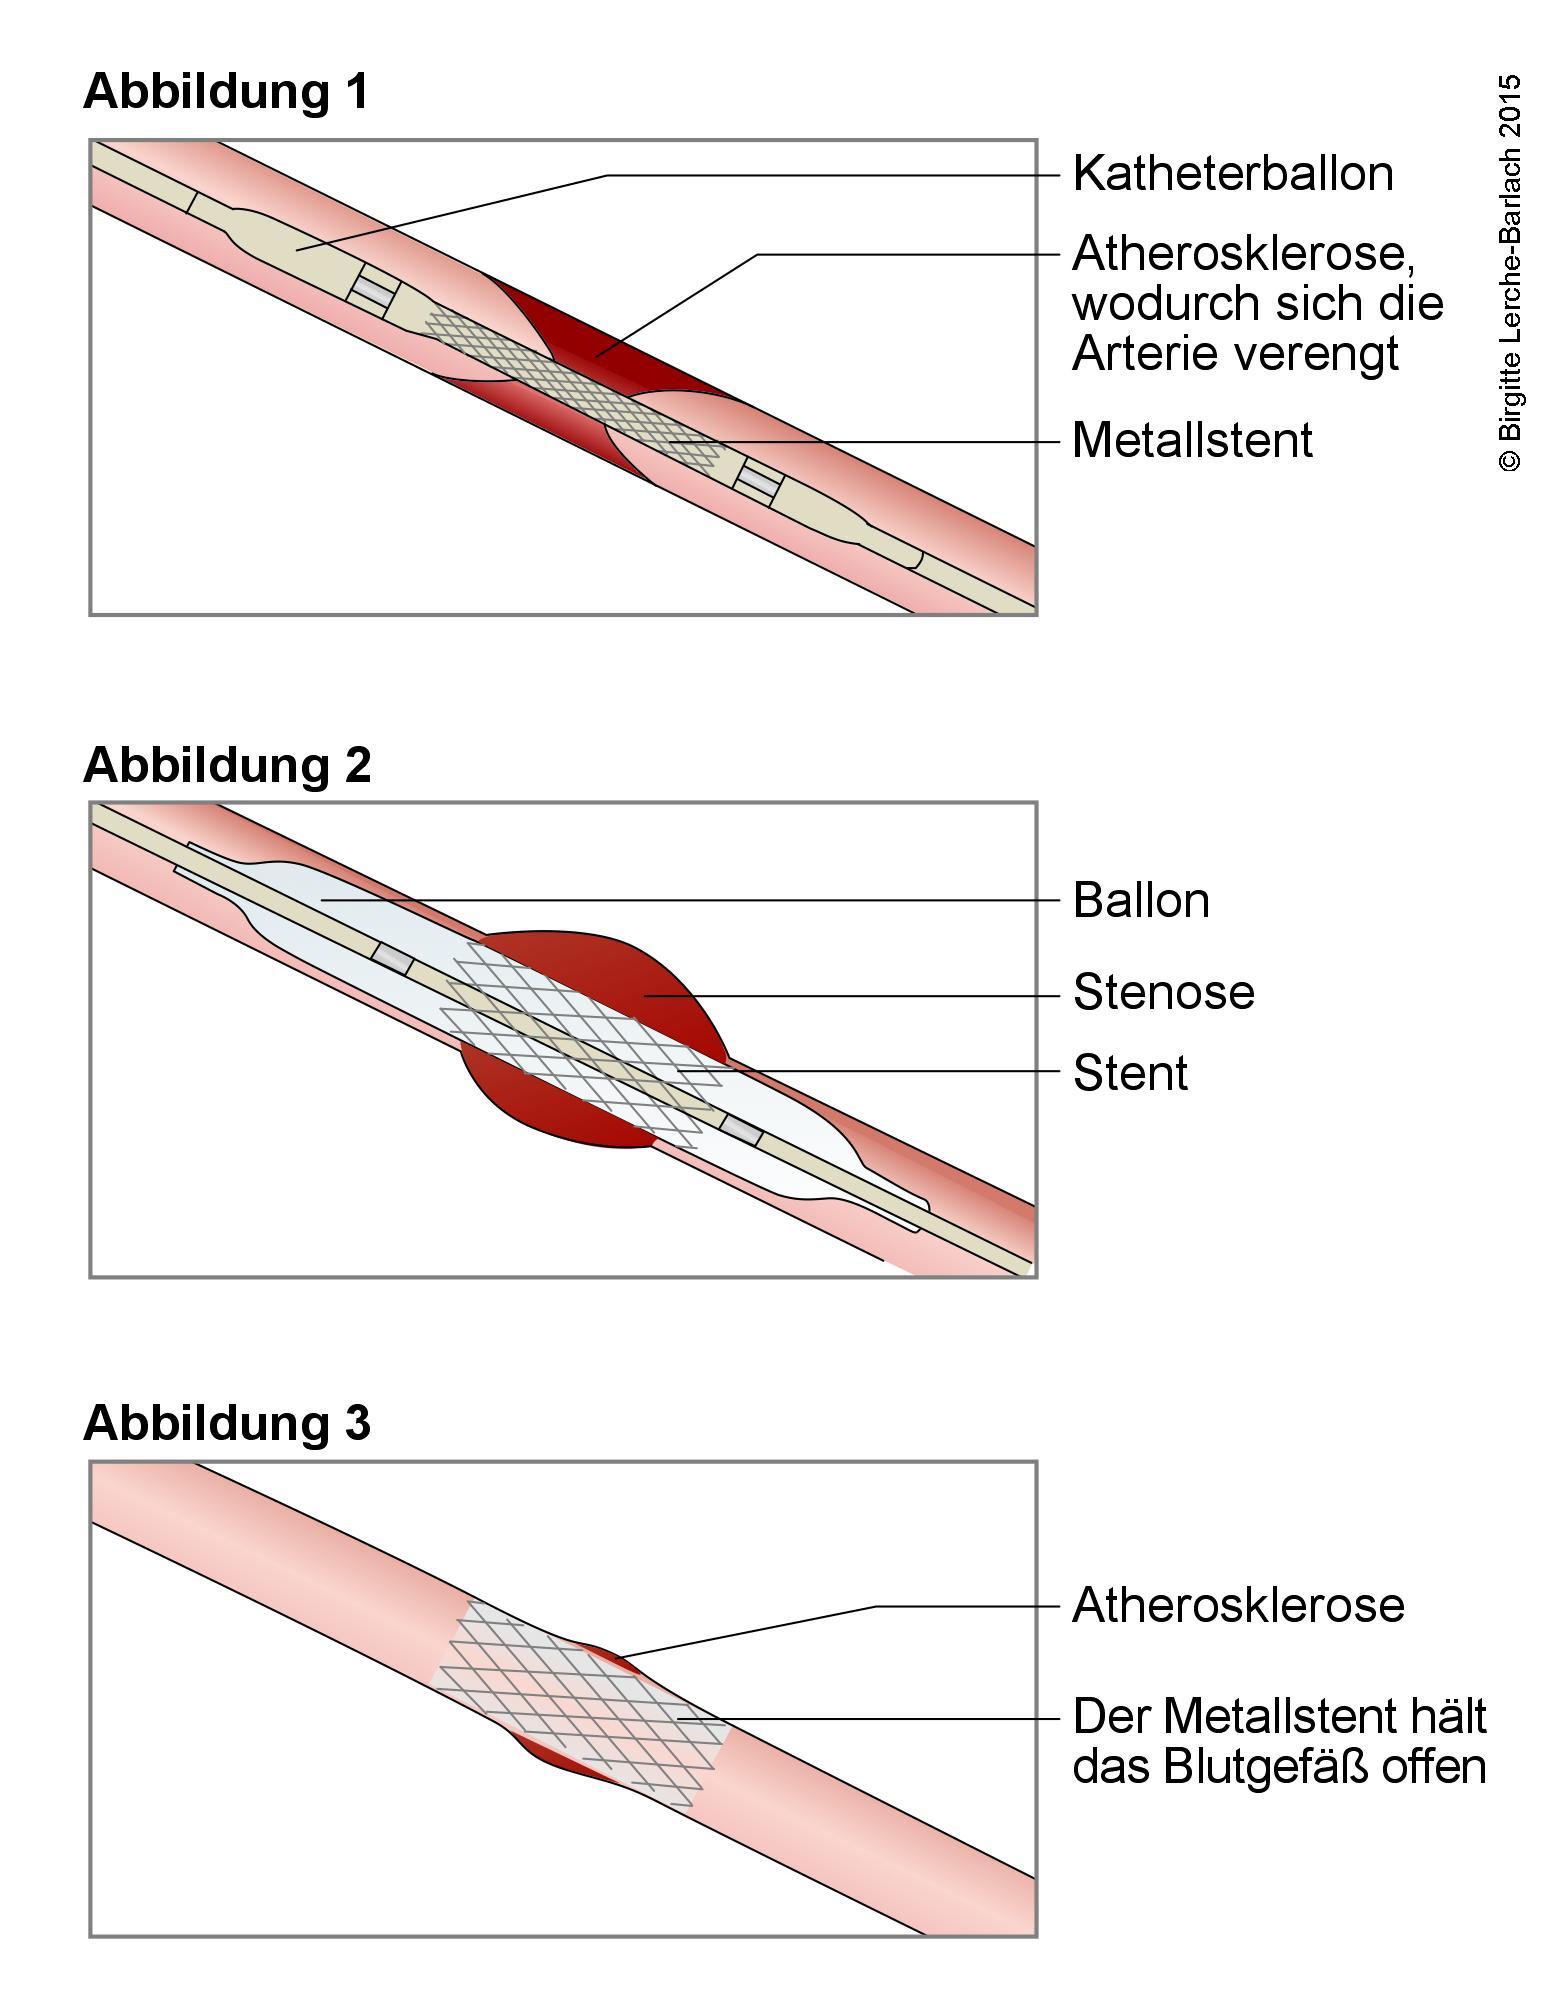 Stentbehandlung bei verengtem Blutgefaessen.jpg